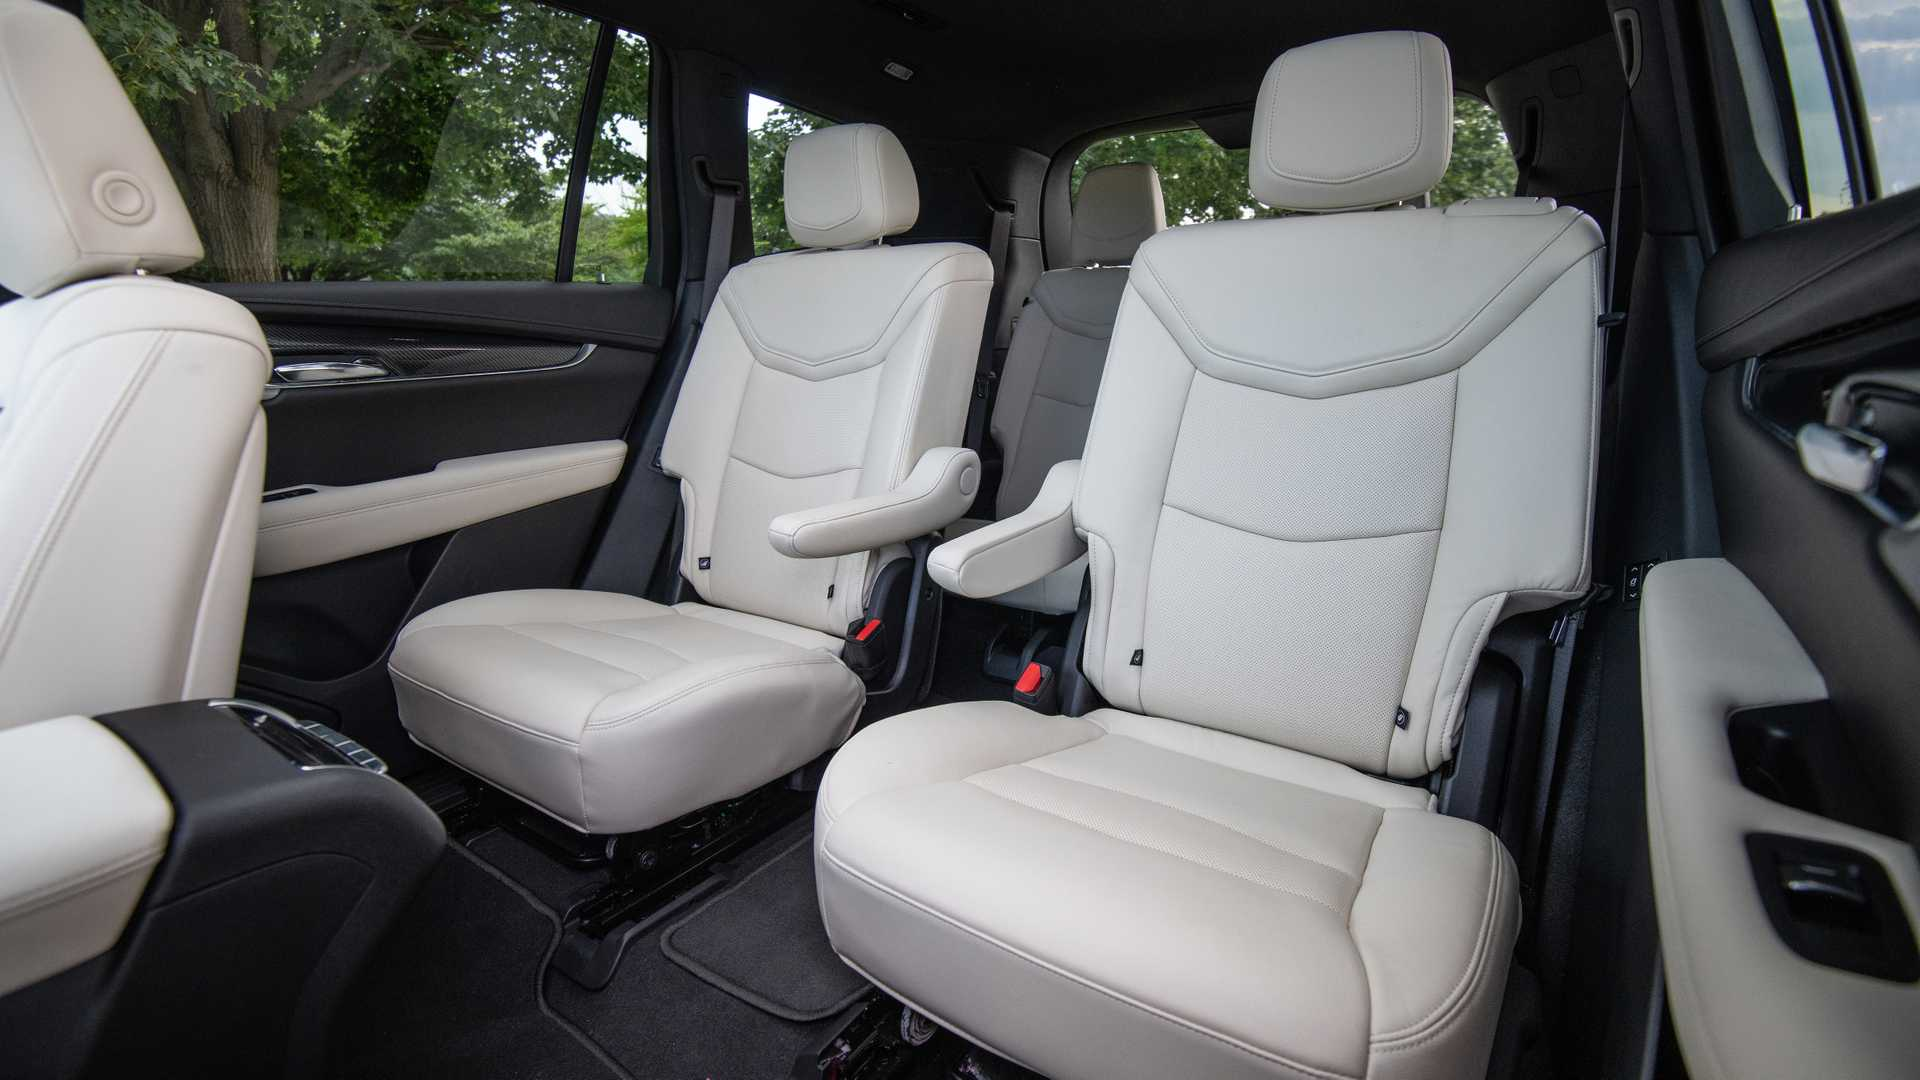 85 All New 2020 Cadillac Xt6 Interior Reviews for 2020 Cadillac Xt6 Interior